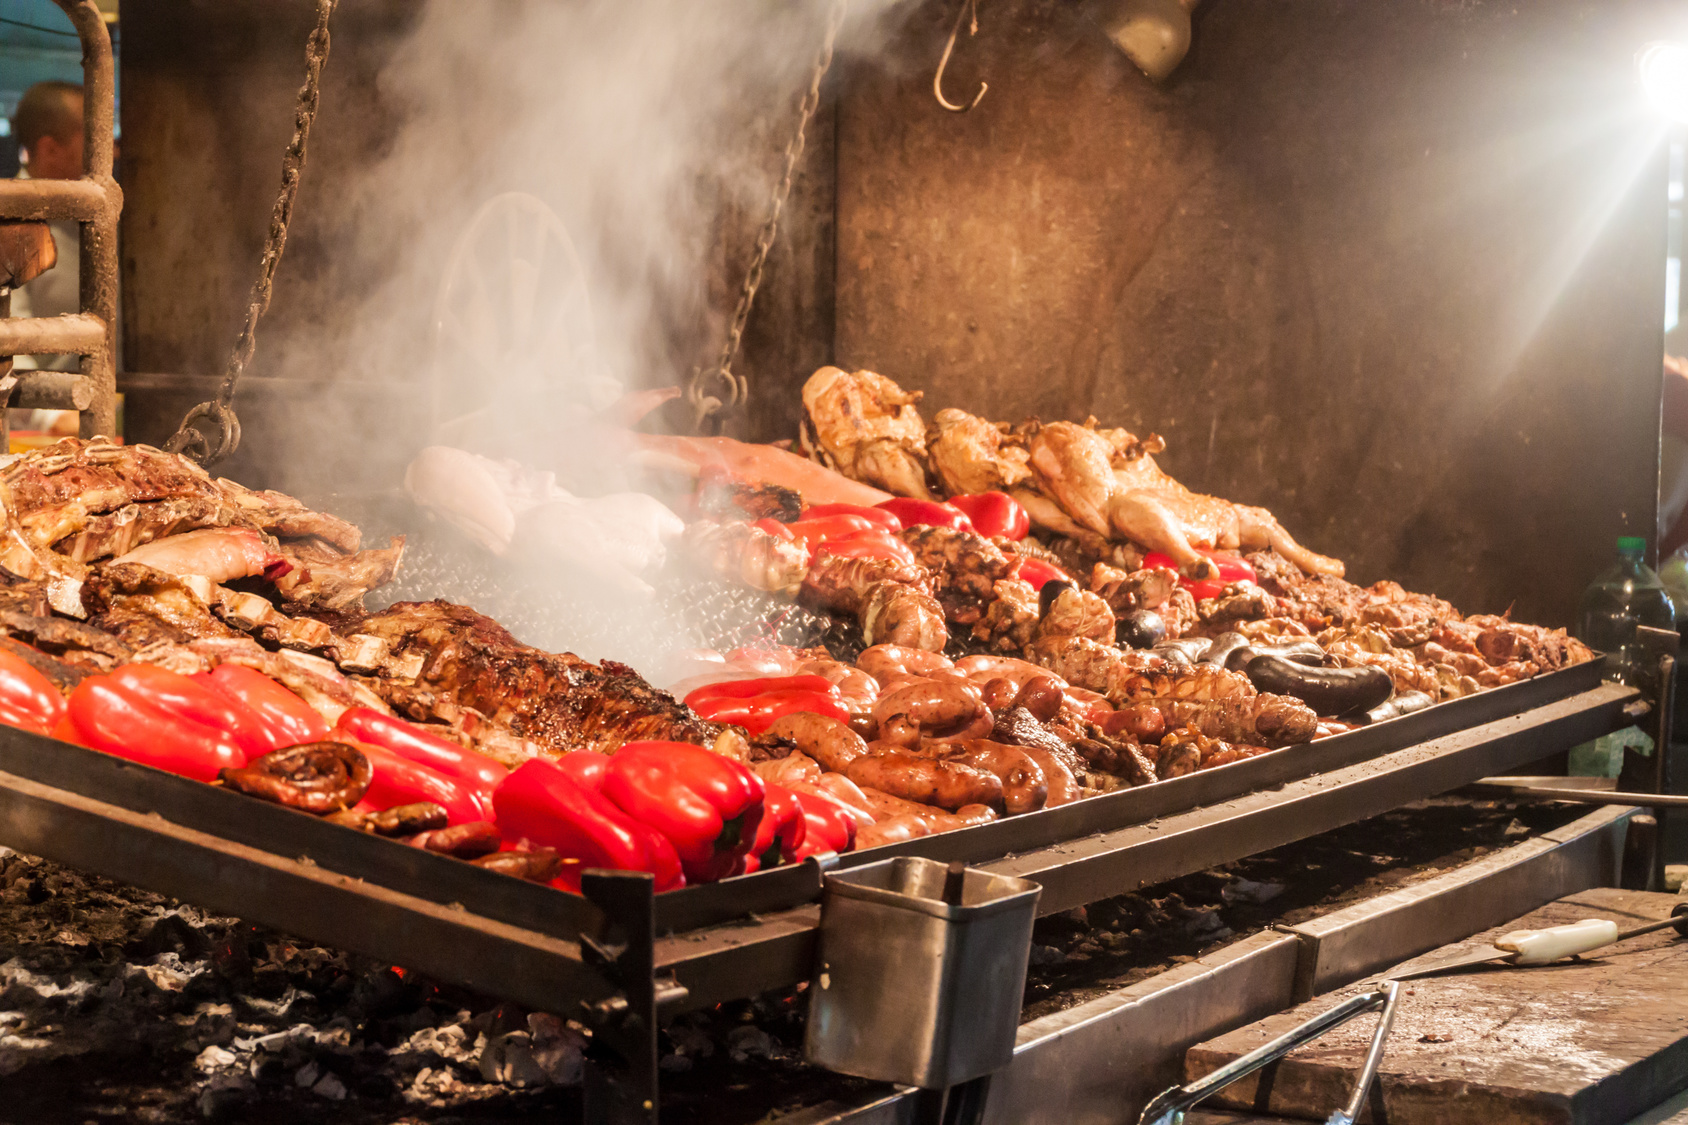 cuisine en uruguay   les sp u00e9cialit u00e9s culaines  u00e0 d u00e9couvrir